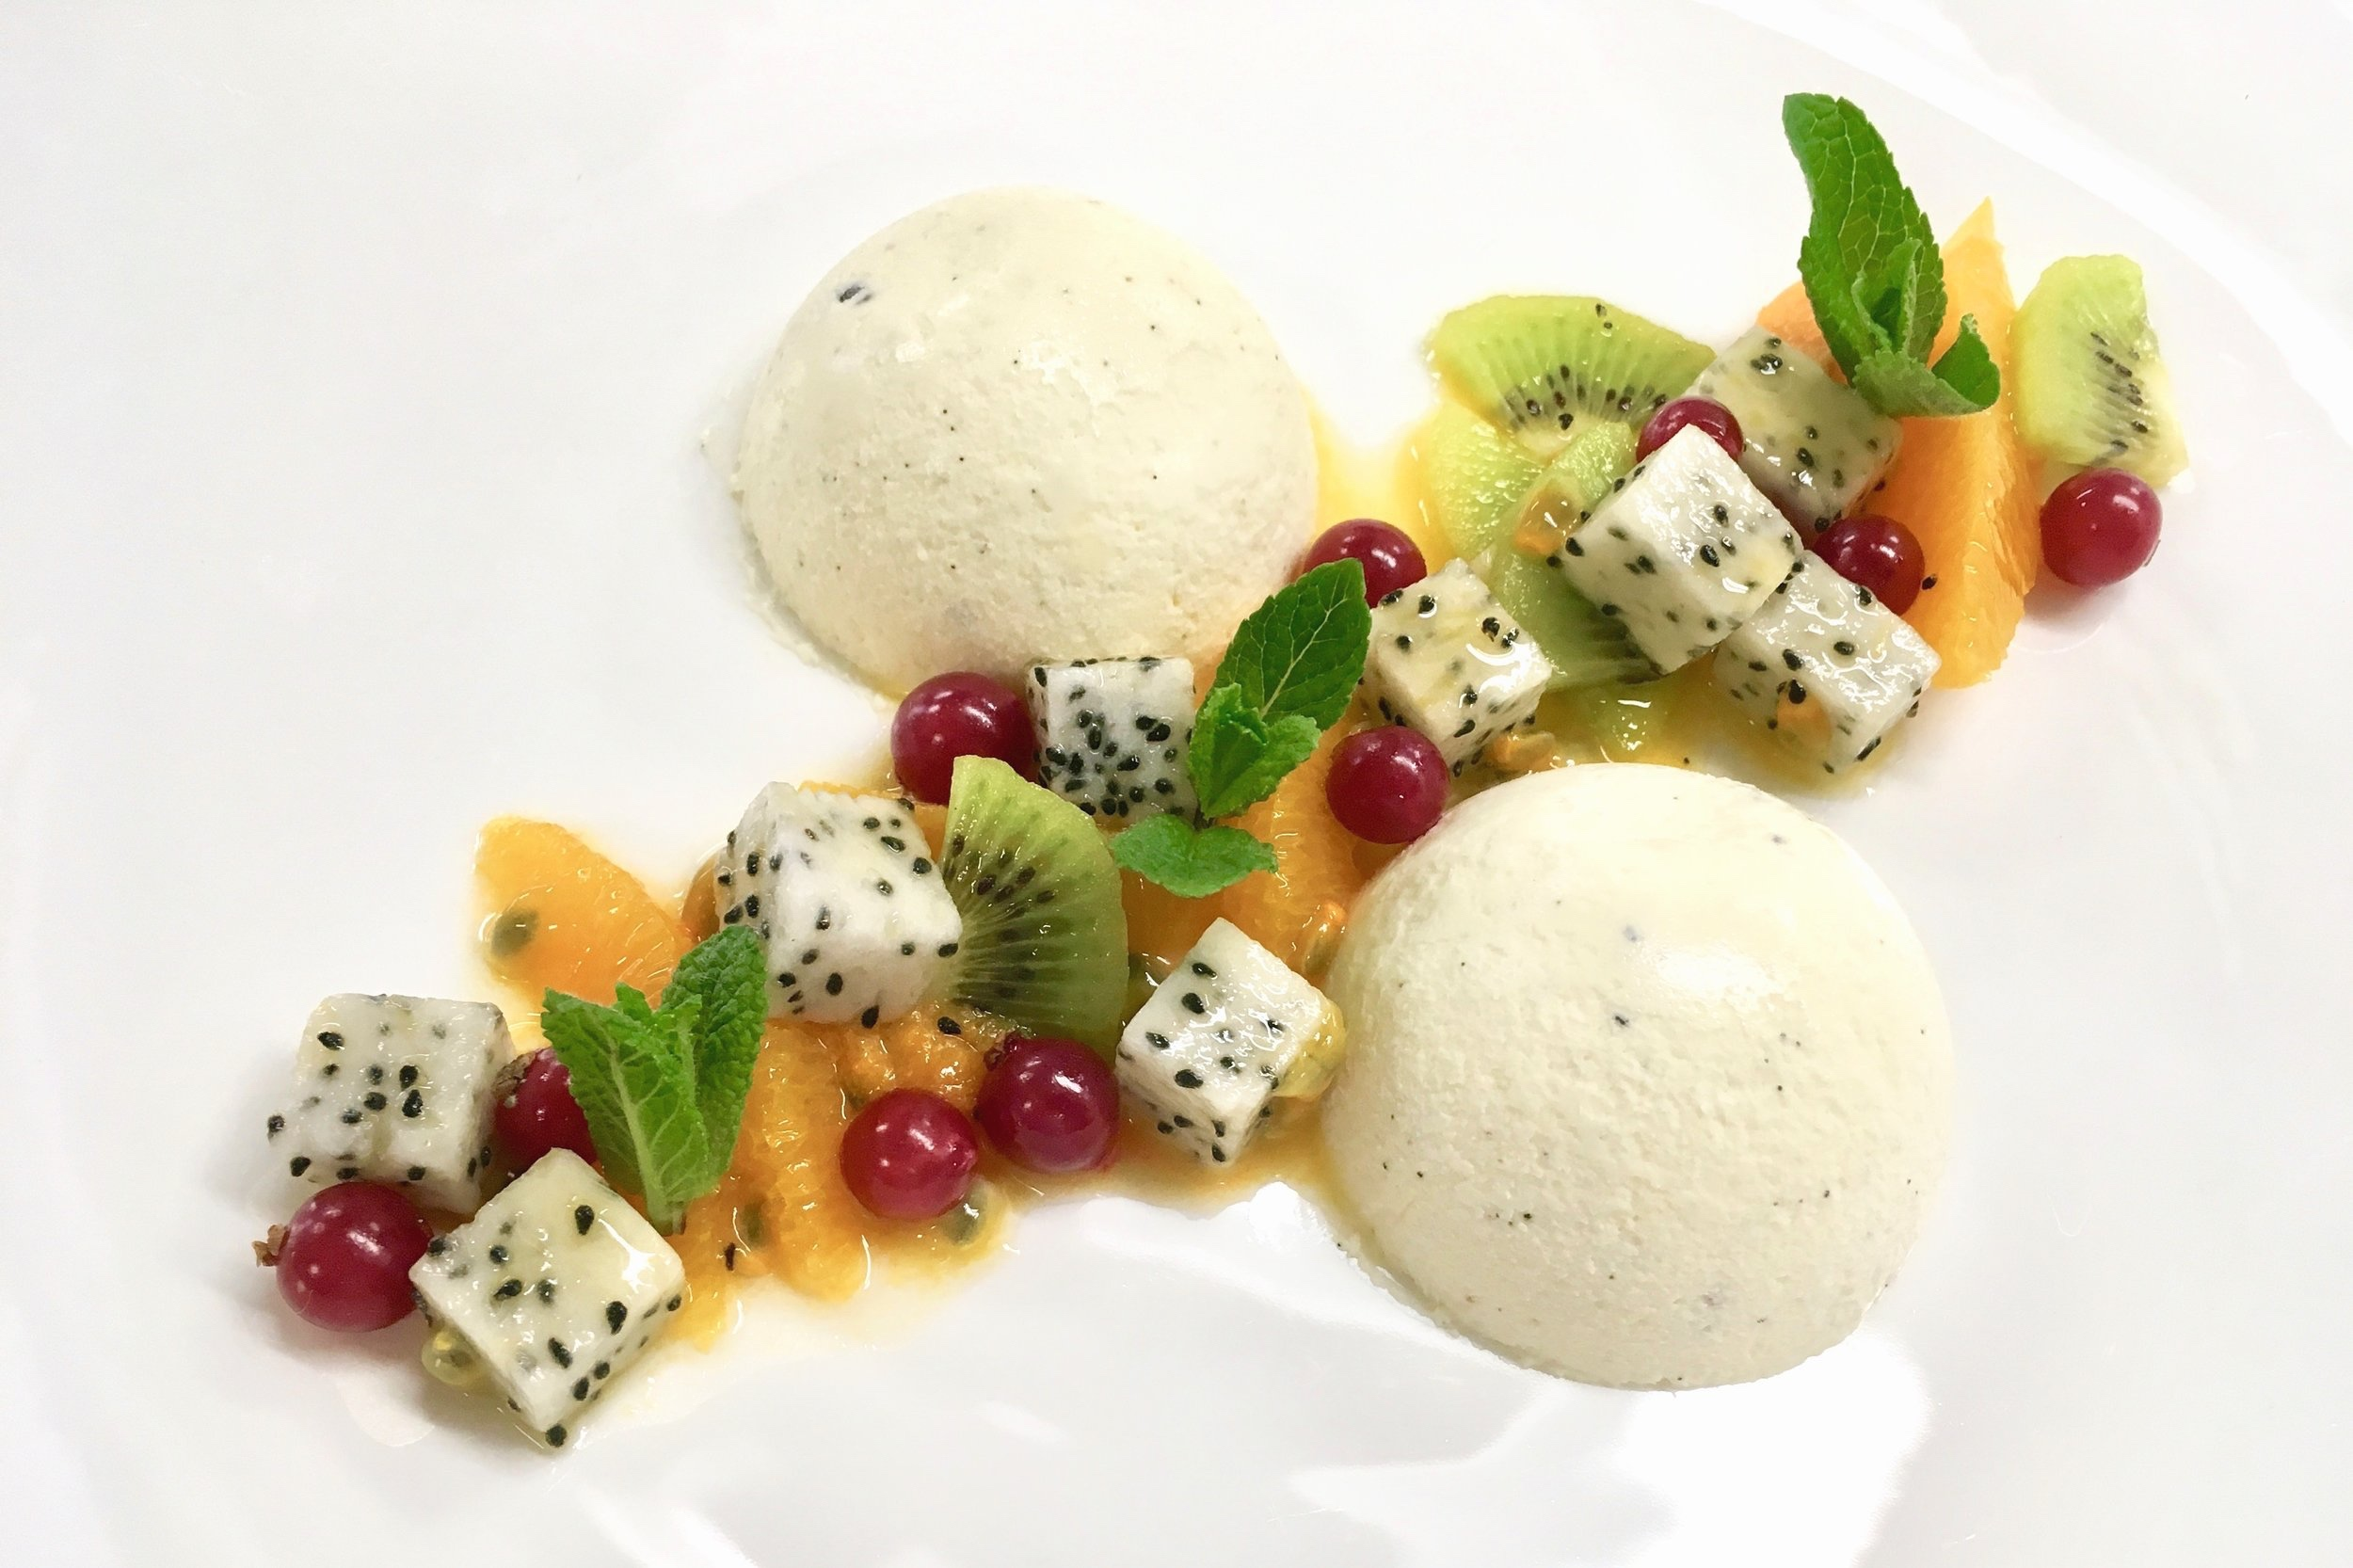 Vanilla Bavarian cream with exotic fruit